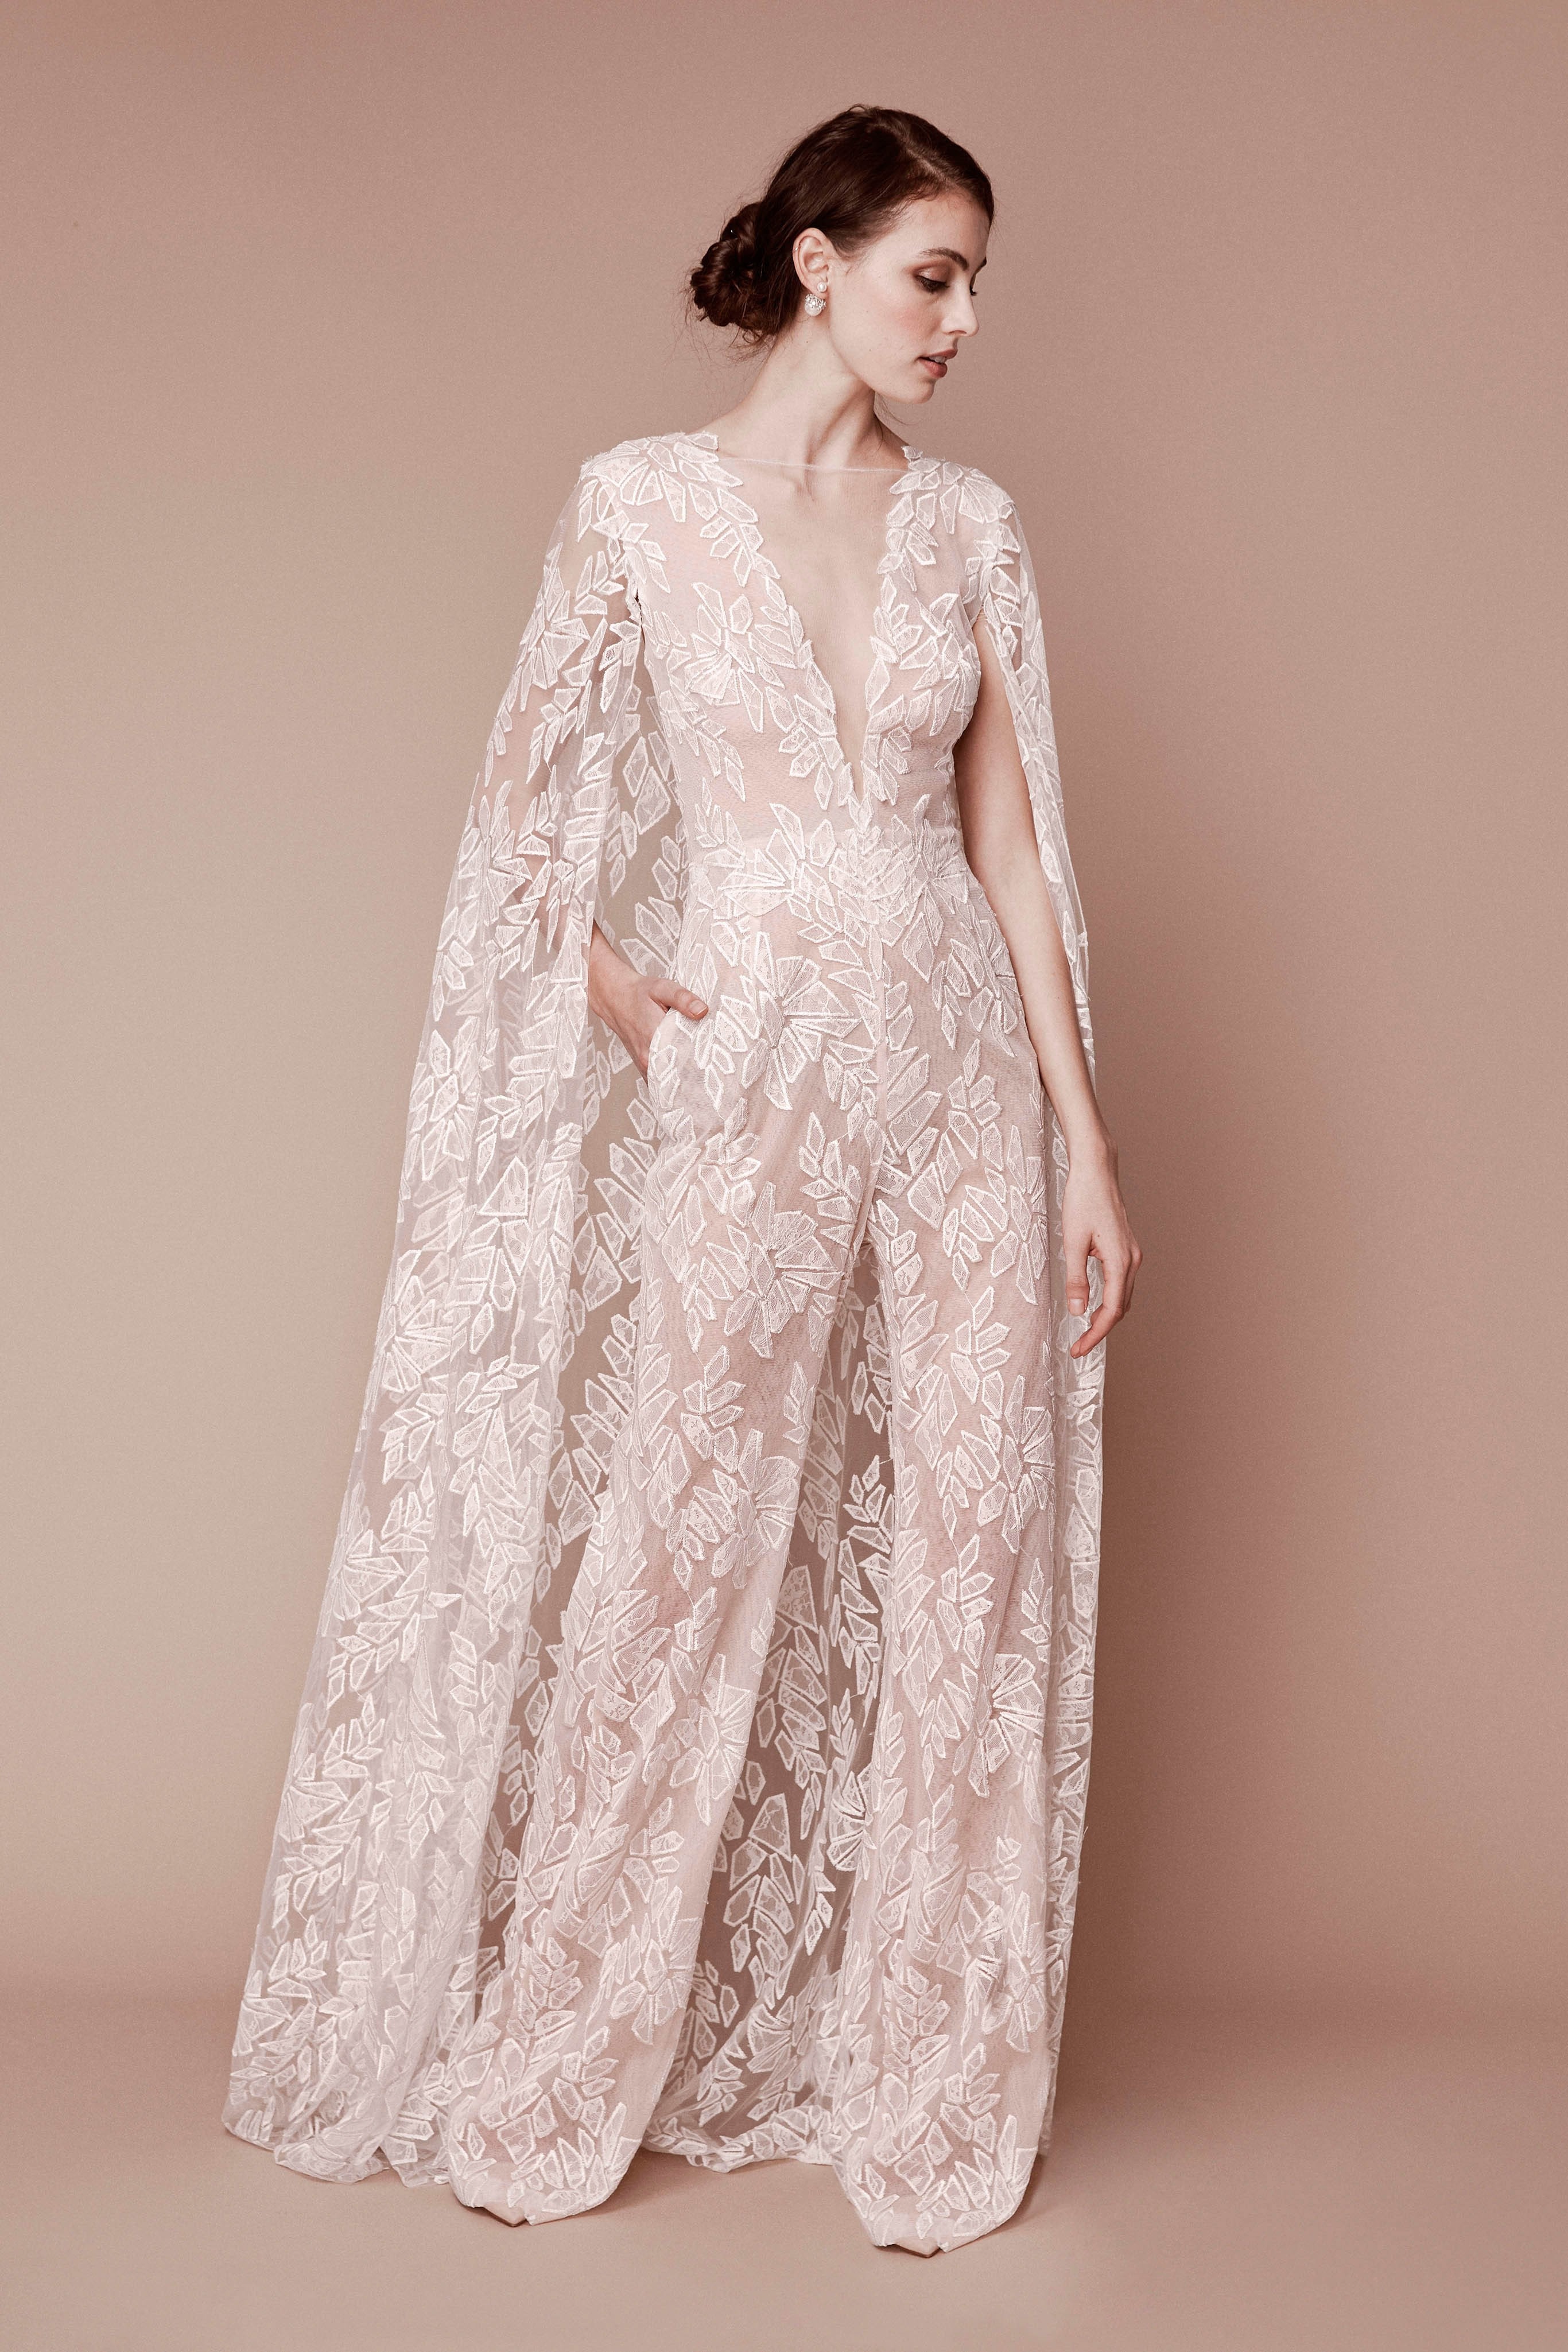 Most Stunning Wedding Dresses From New York Bridal Fashion Week 2019